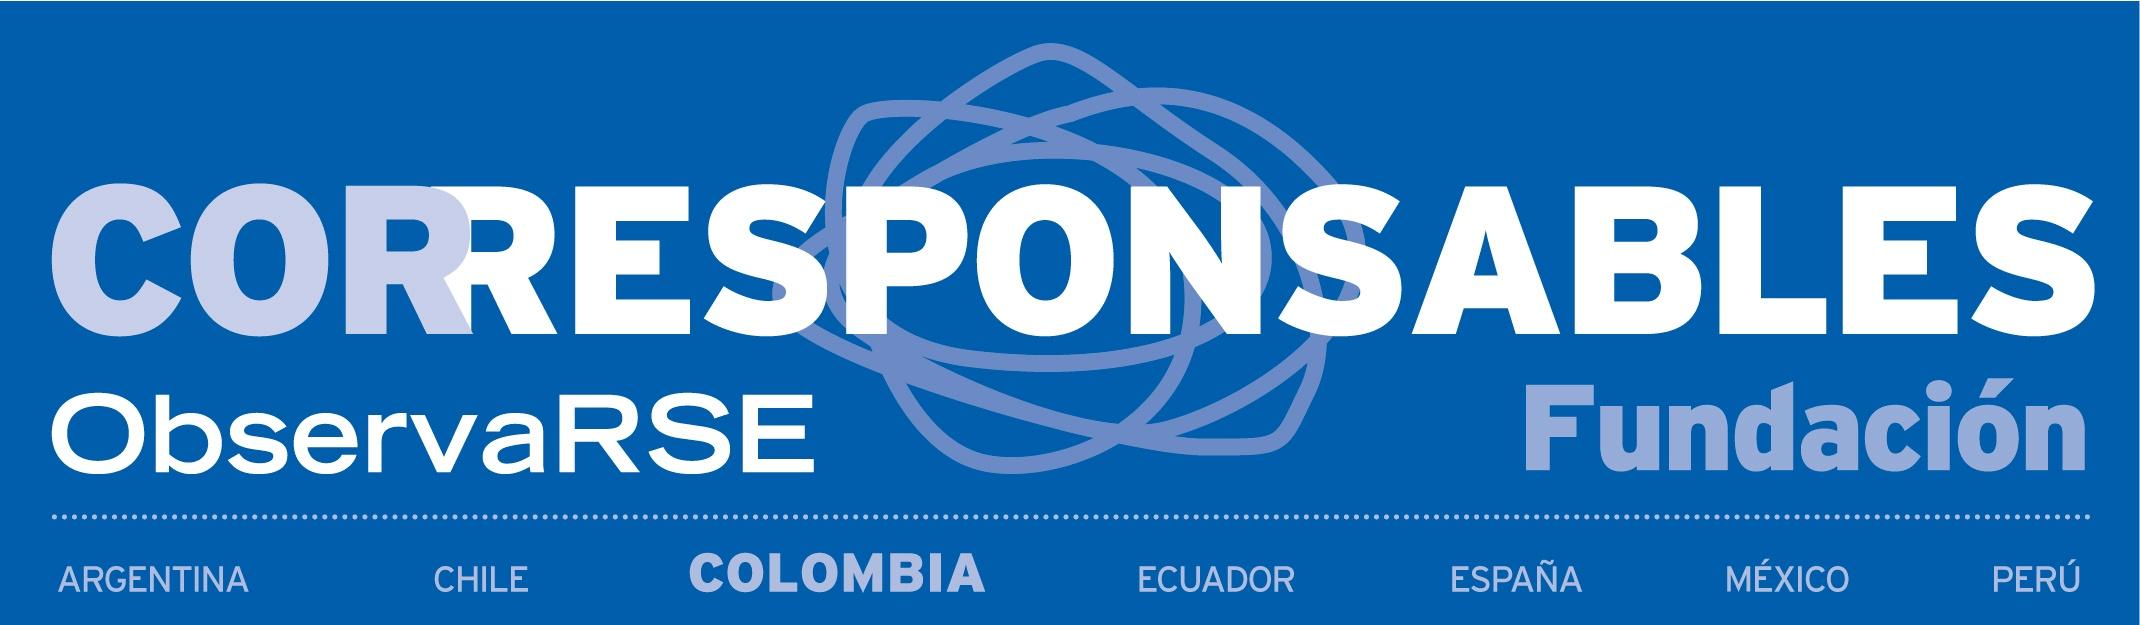 CORRESPONSABLES logo colombia(C-25-01-2018).jpg